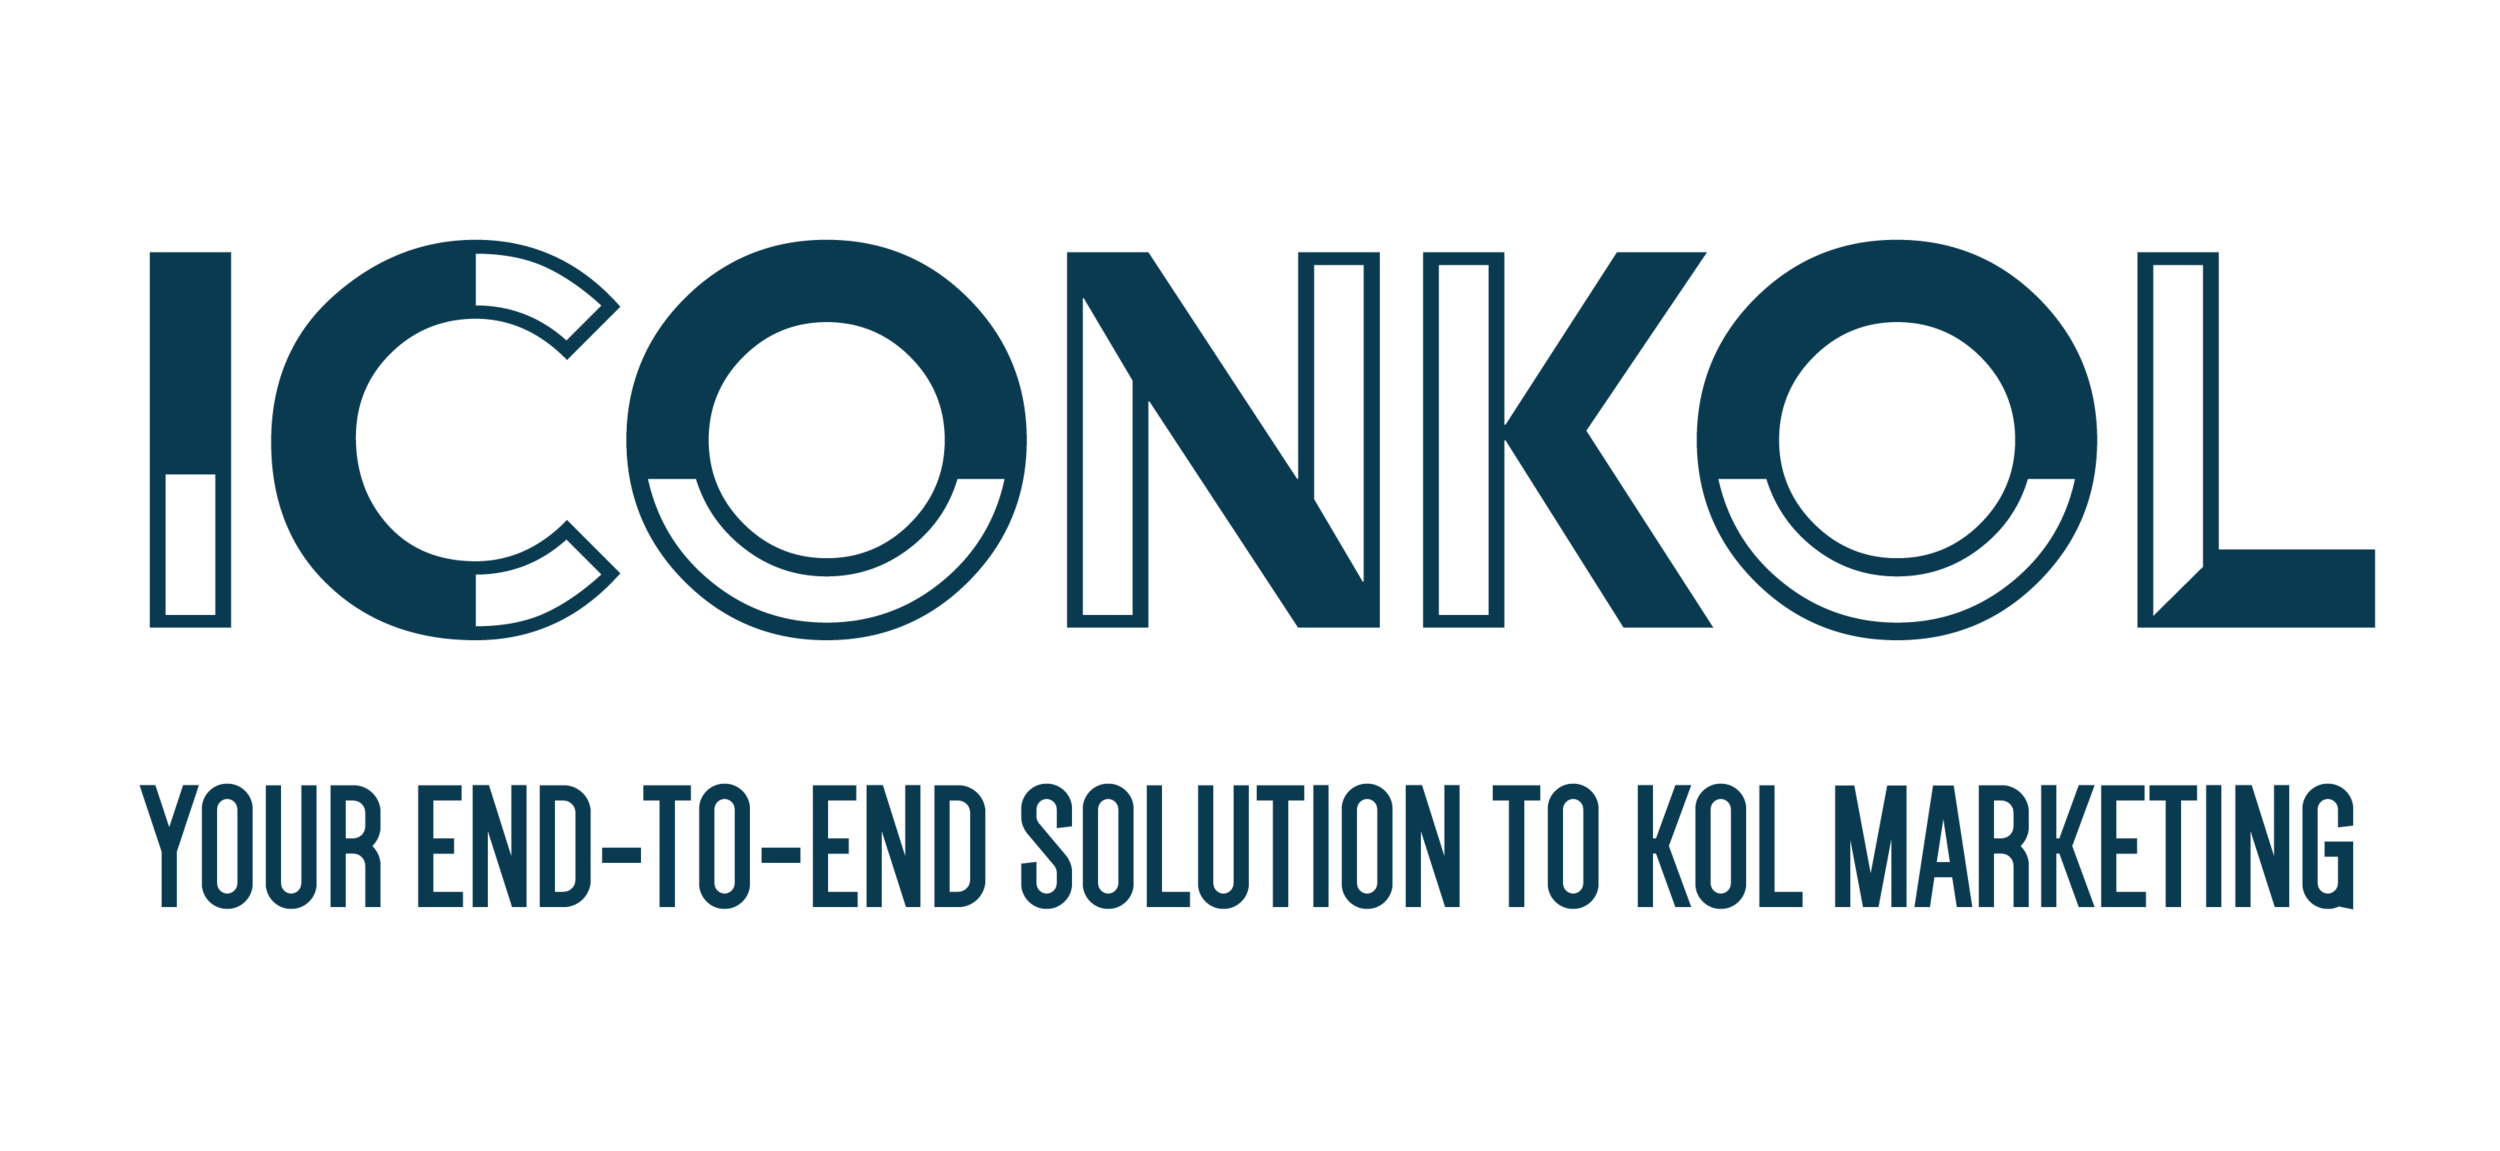 ICONKOL Logo New.png